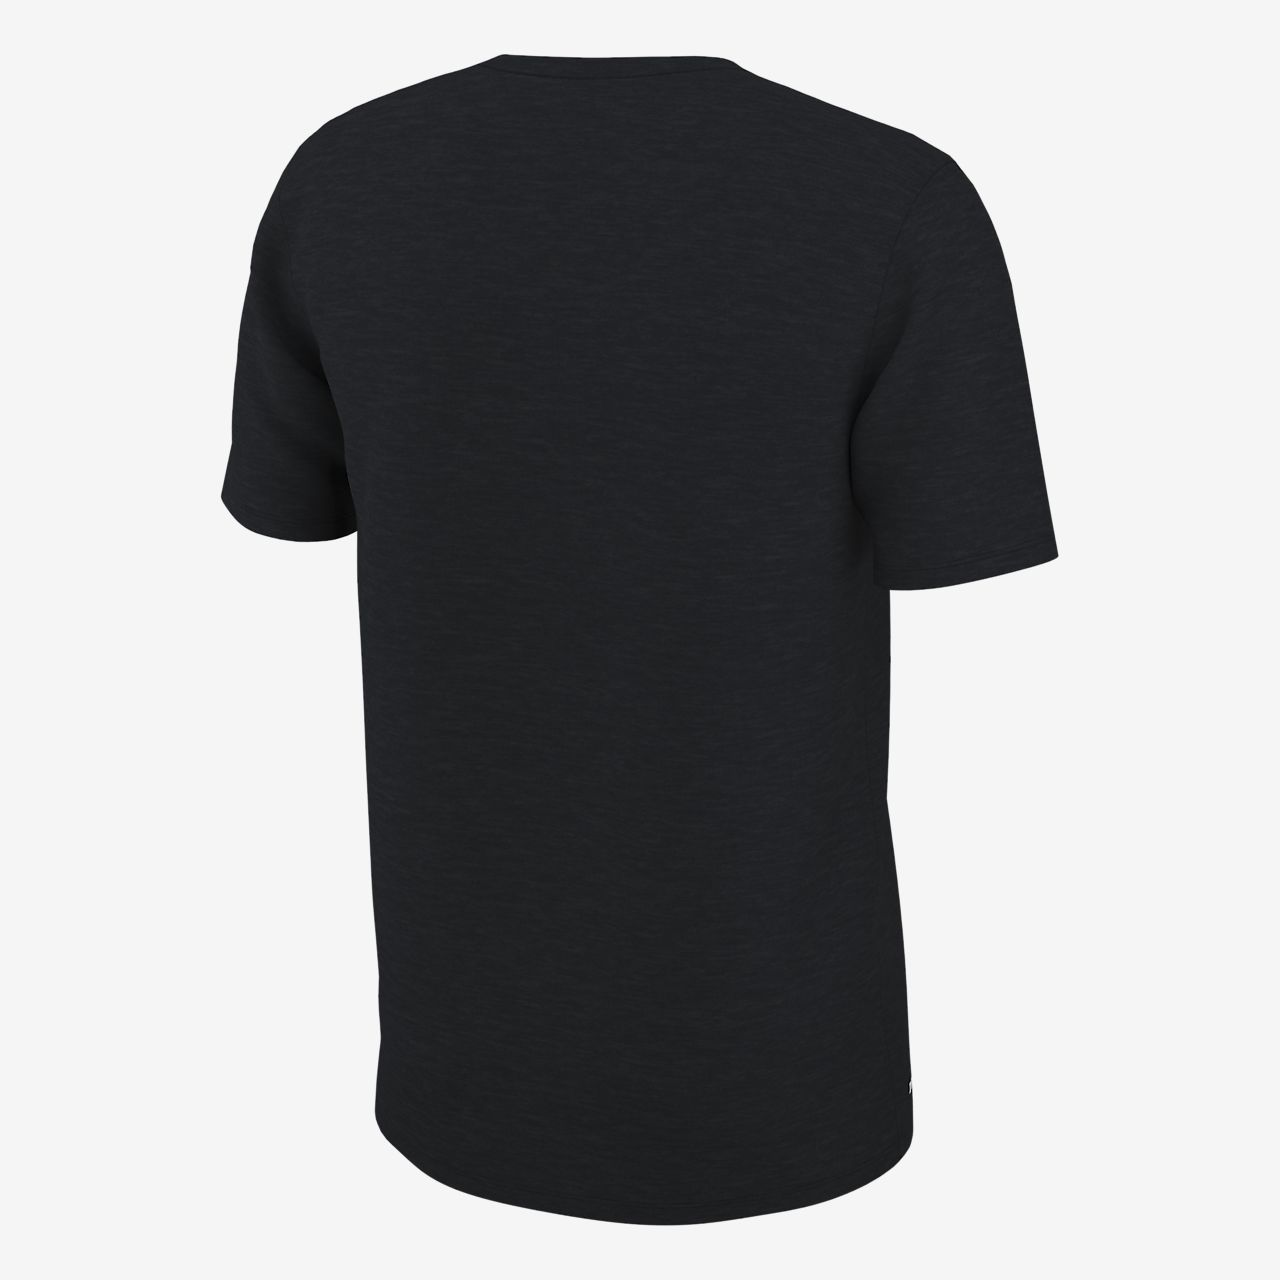 ec96cf24980 Nike Dri-FIT (NFL Packers) Men's T-Shirt. Nike.com